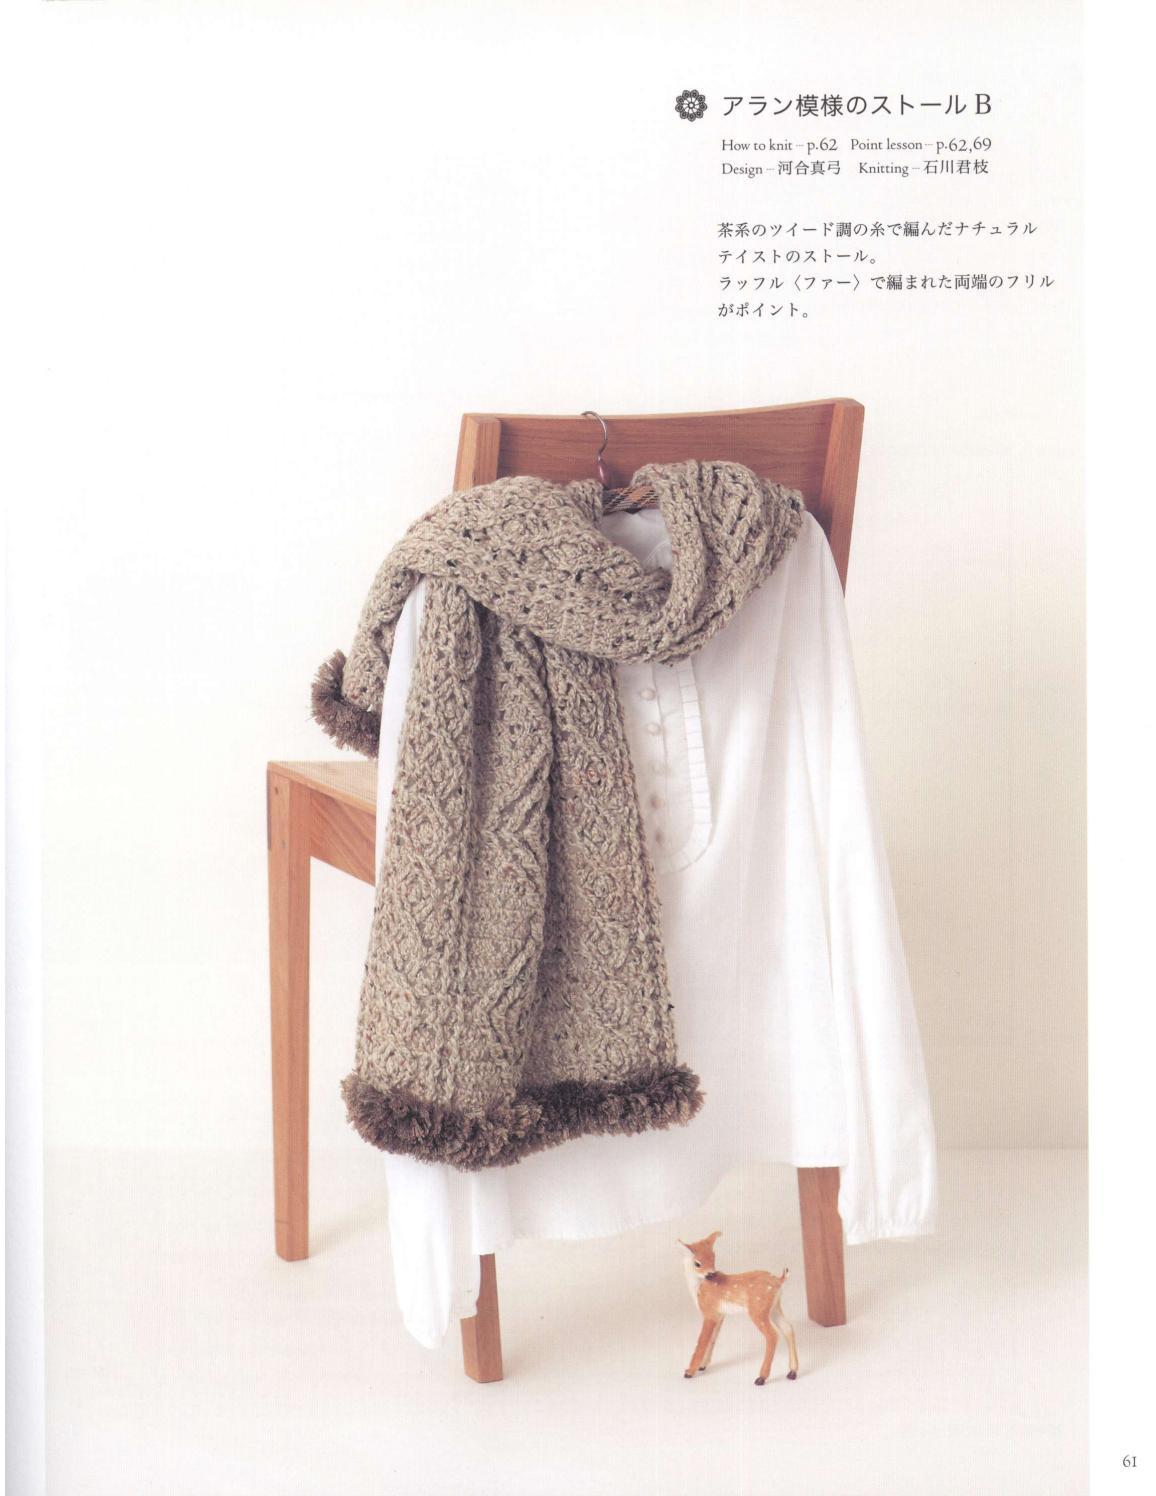 Asahi original crochet best selection 2012 page 61